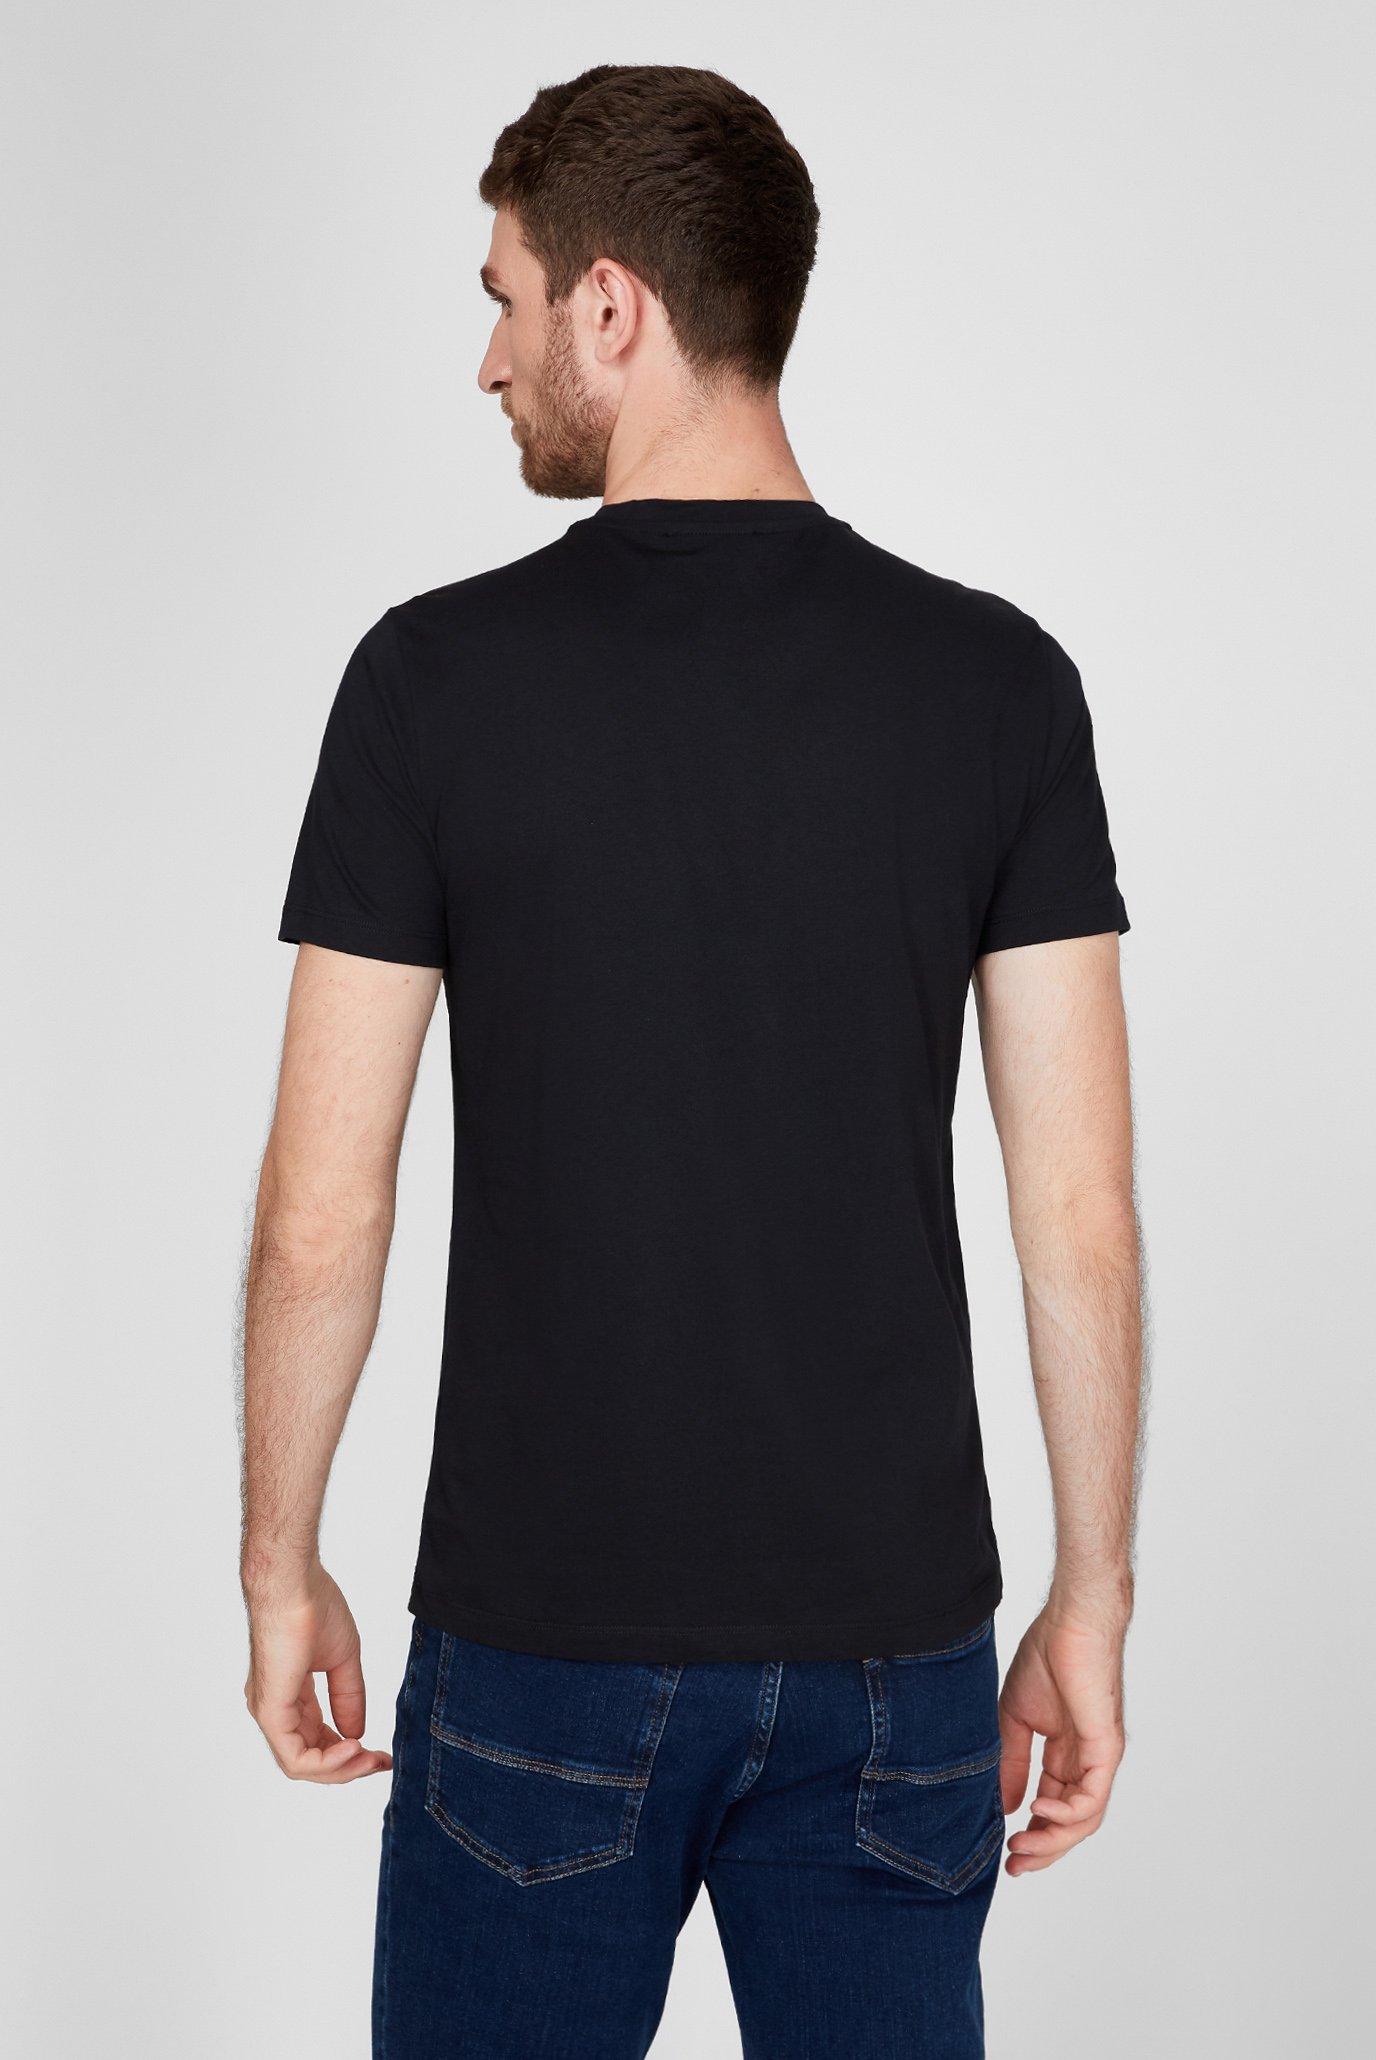 Мужская черная футболка REGULAR FIT Trussardi Jeans